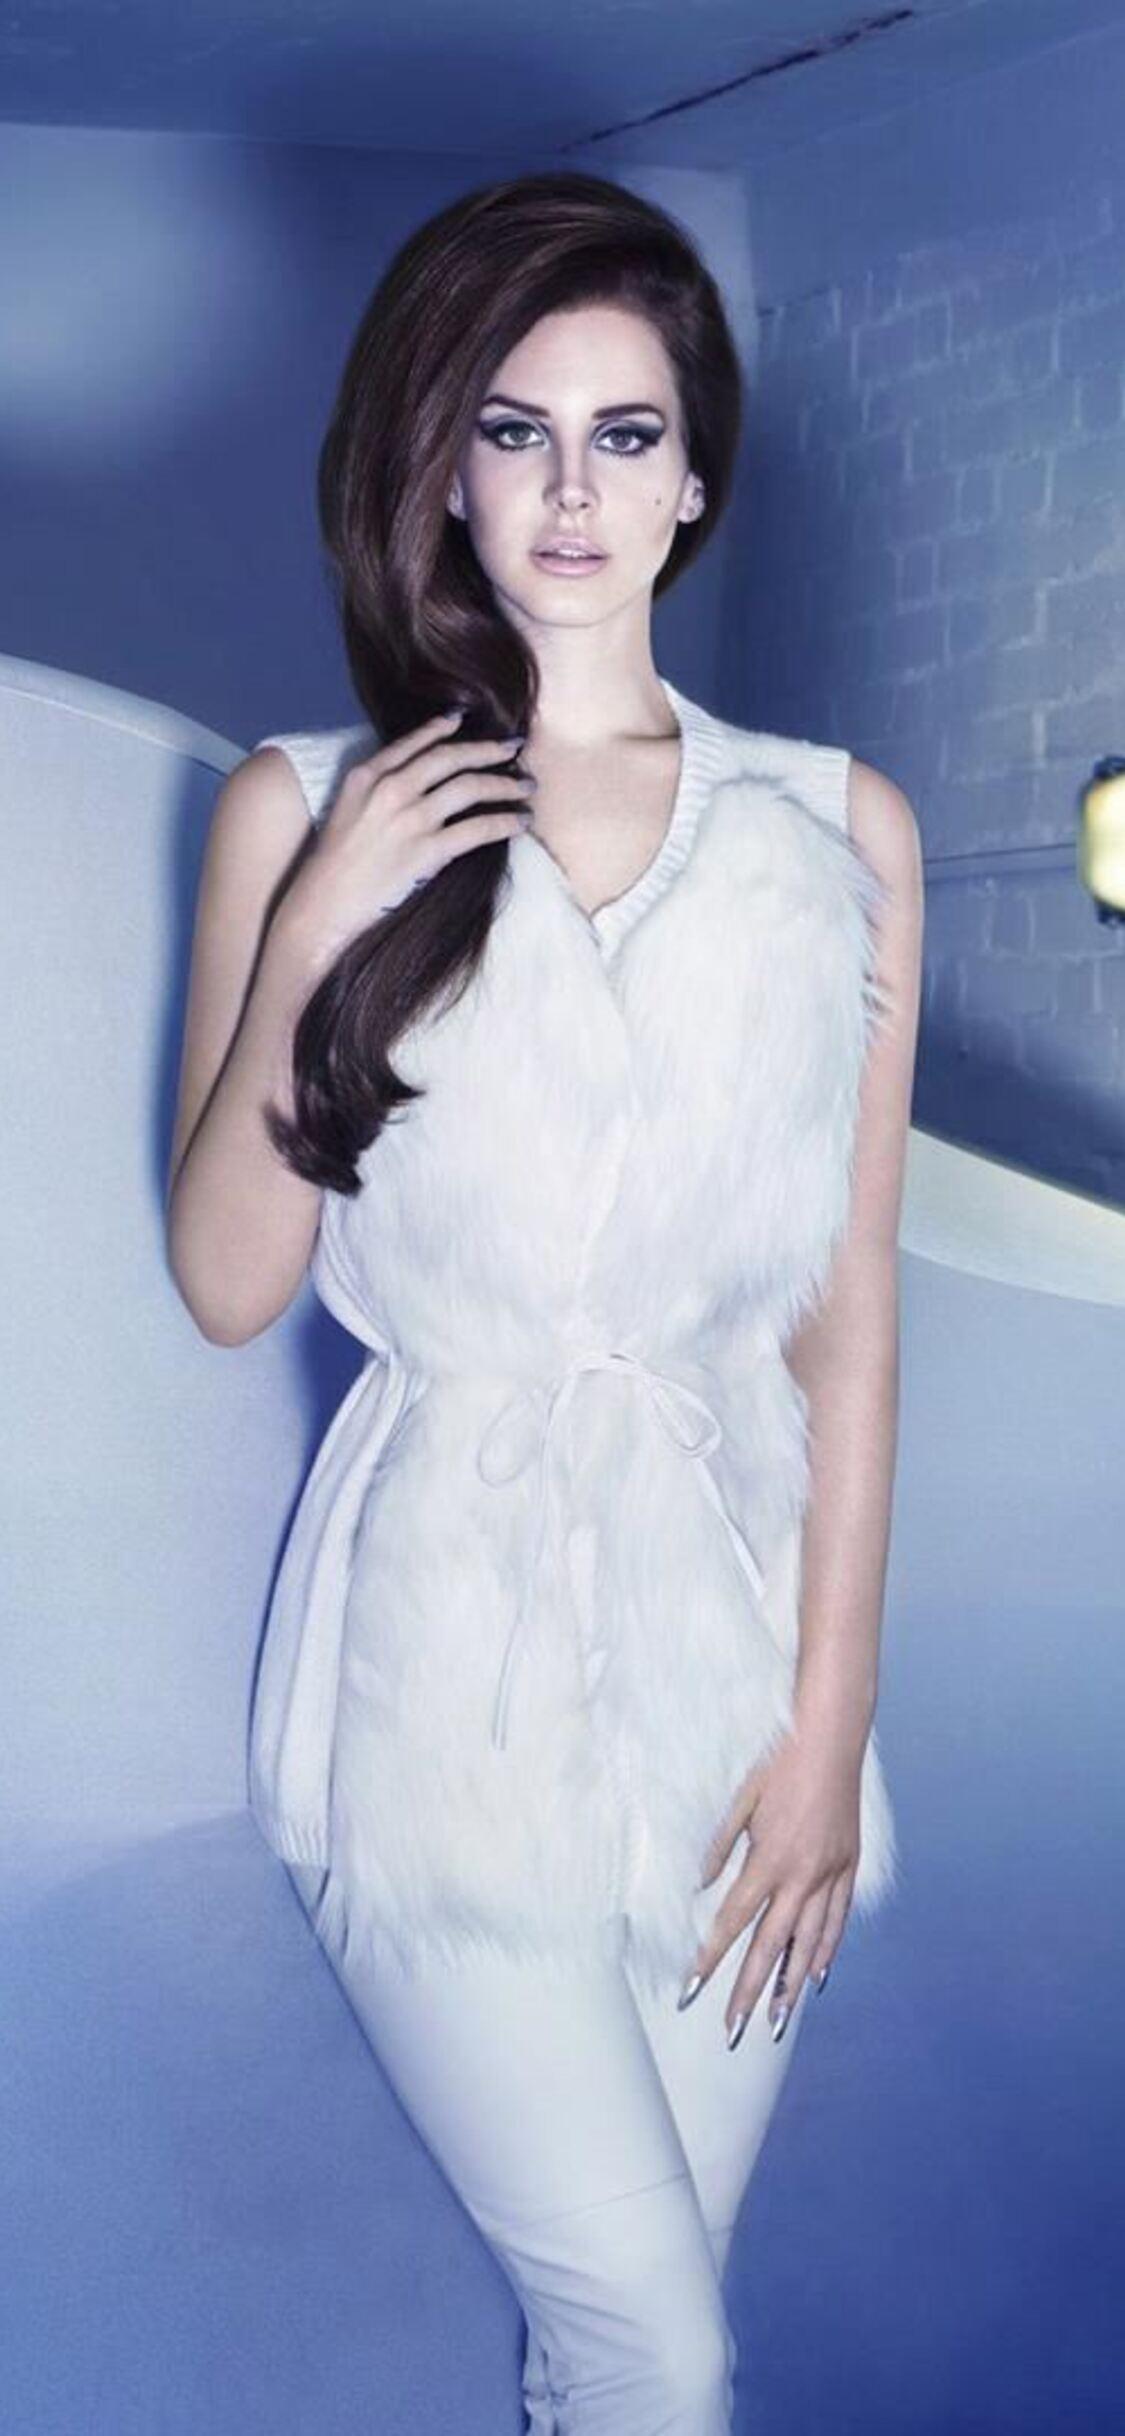 1125x2436 Lana Del Rey Iphone Xs Iphone 10 Iphone X Hd 4k